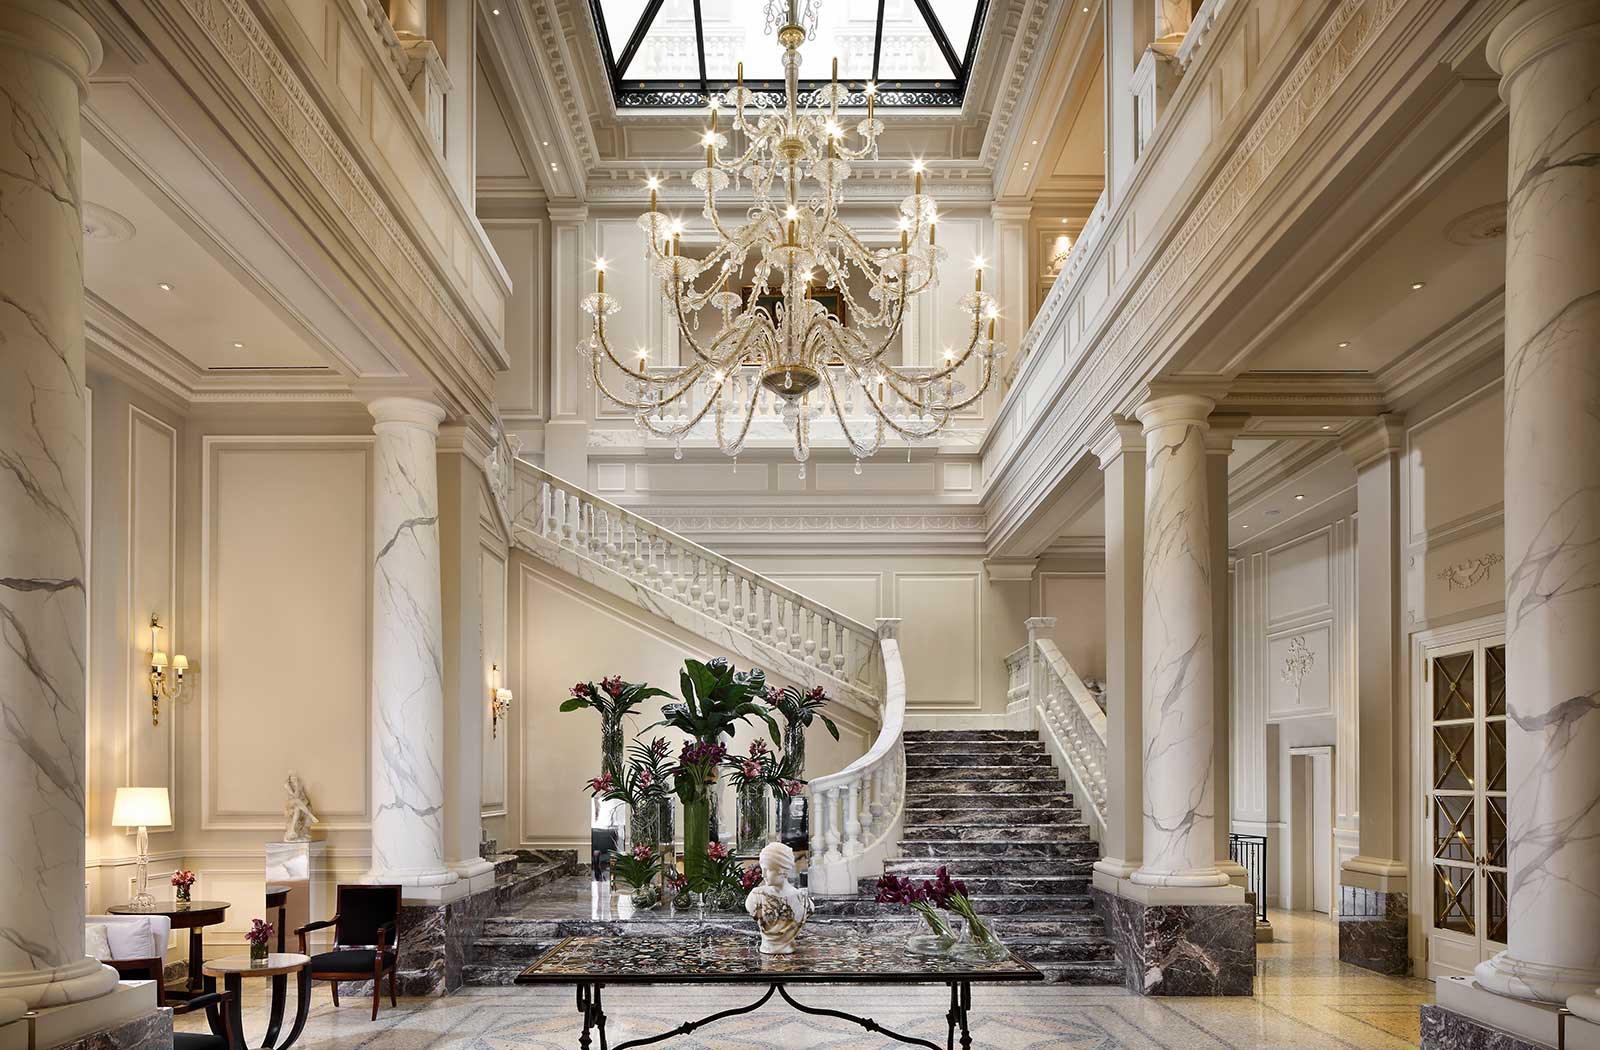 Passion for luxury palazzo parigi hotel grand spa for Design hotel parigi